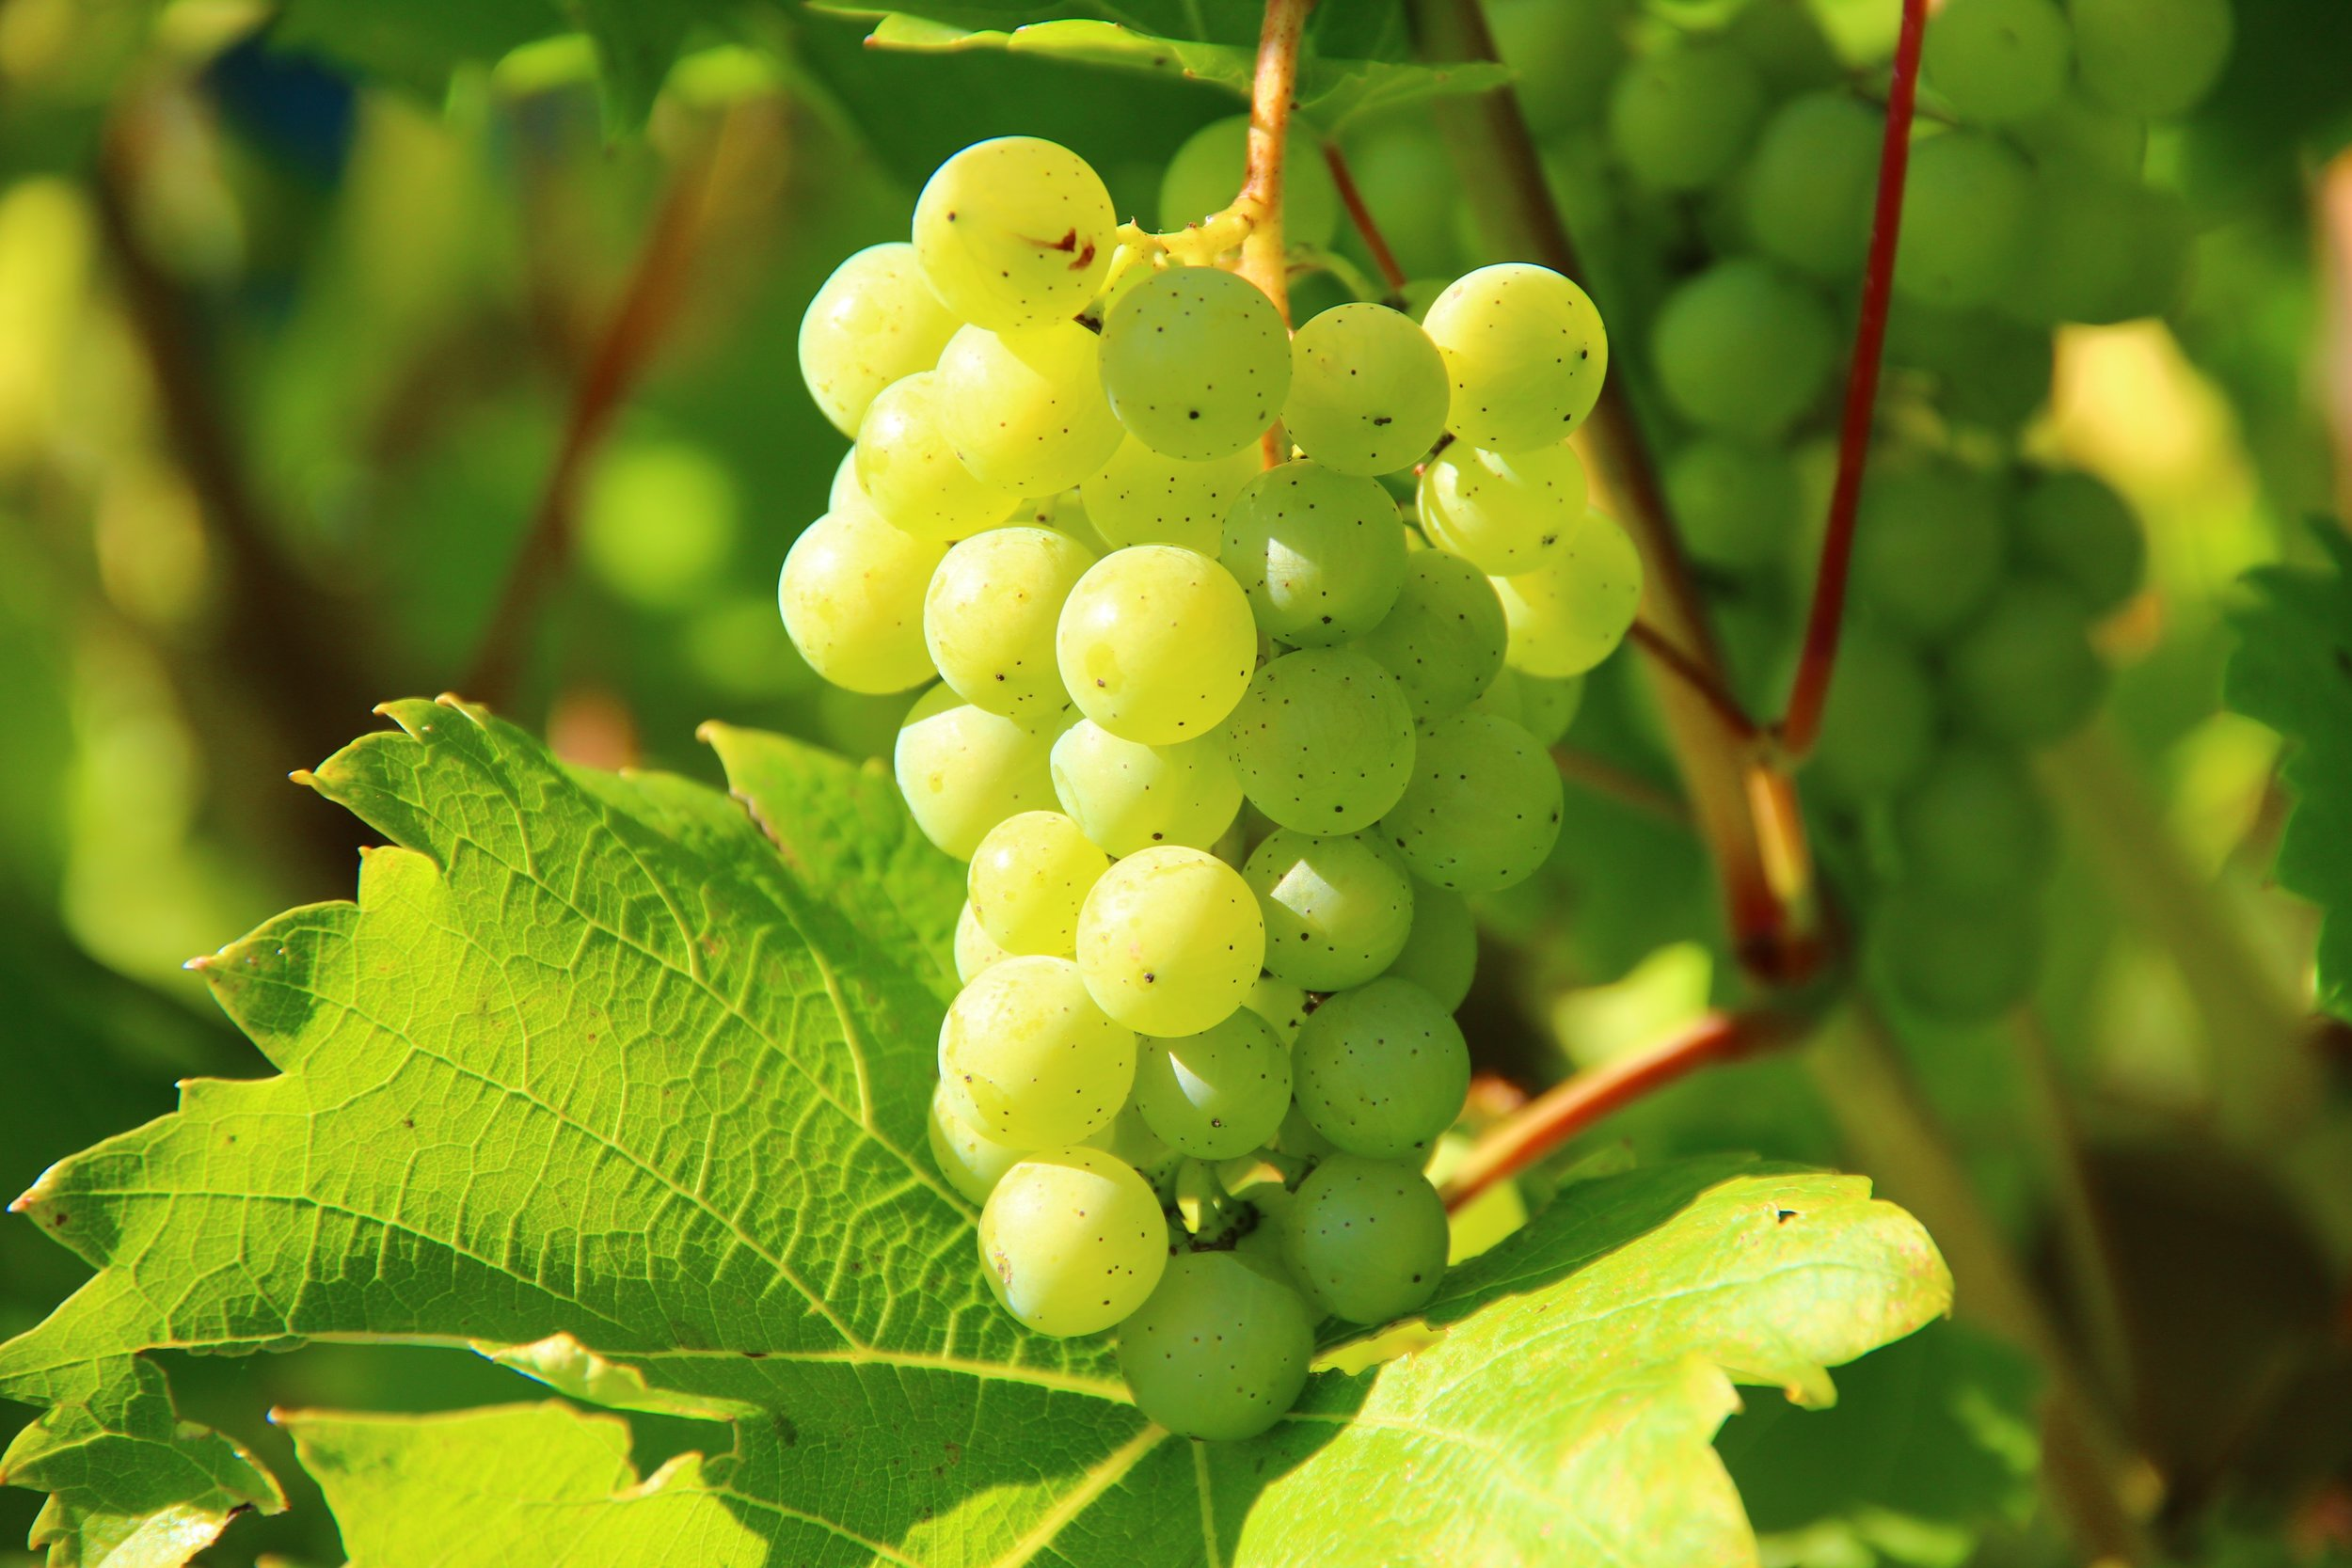 grapes-wine-fruit-vines-60021.jpeg